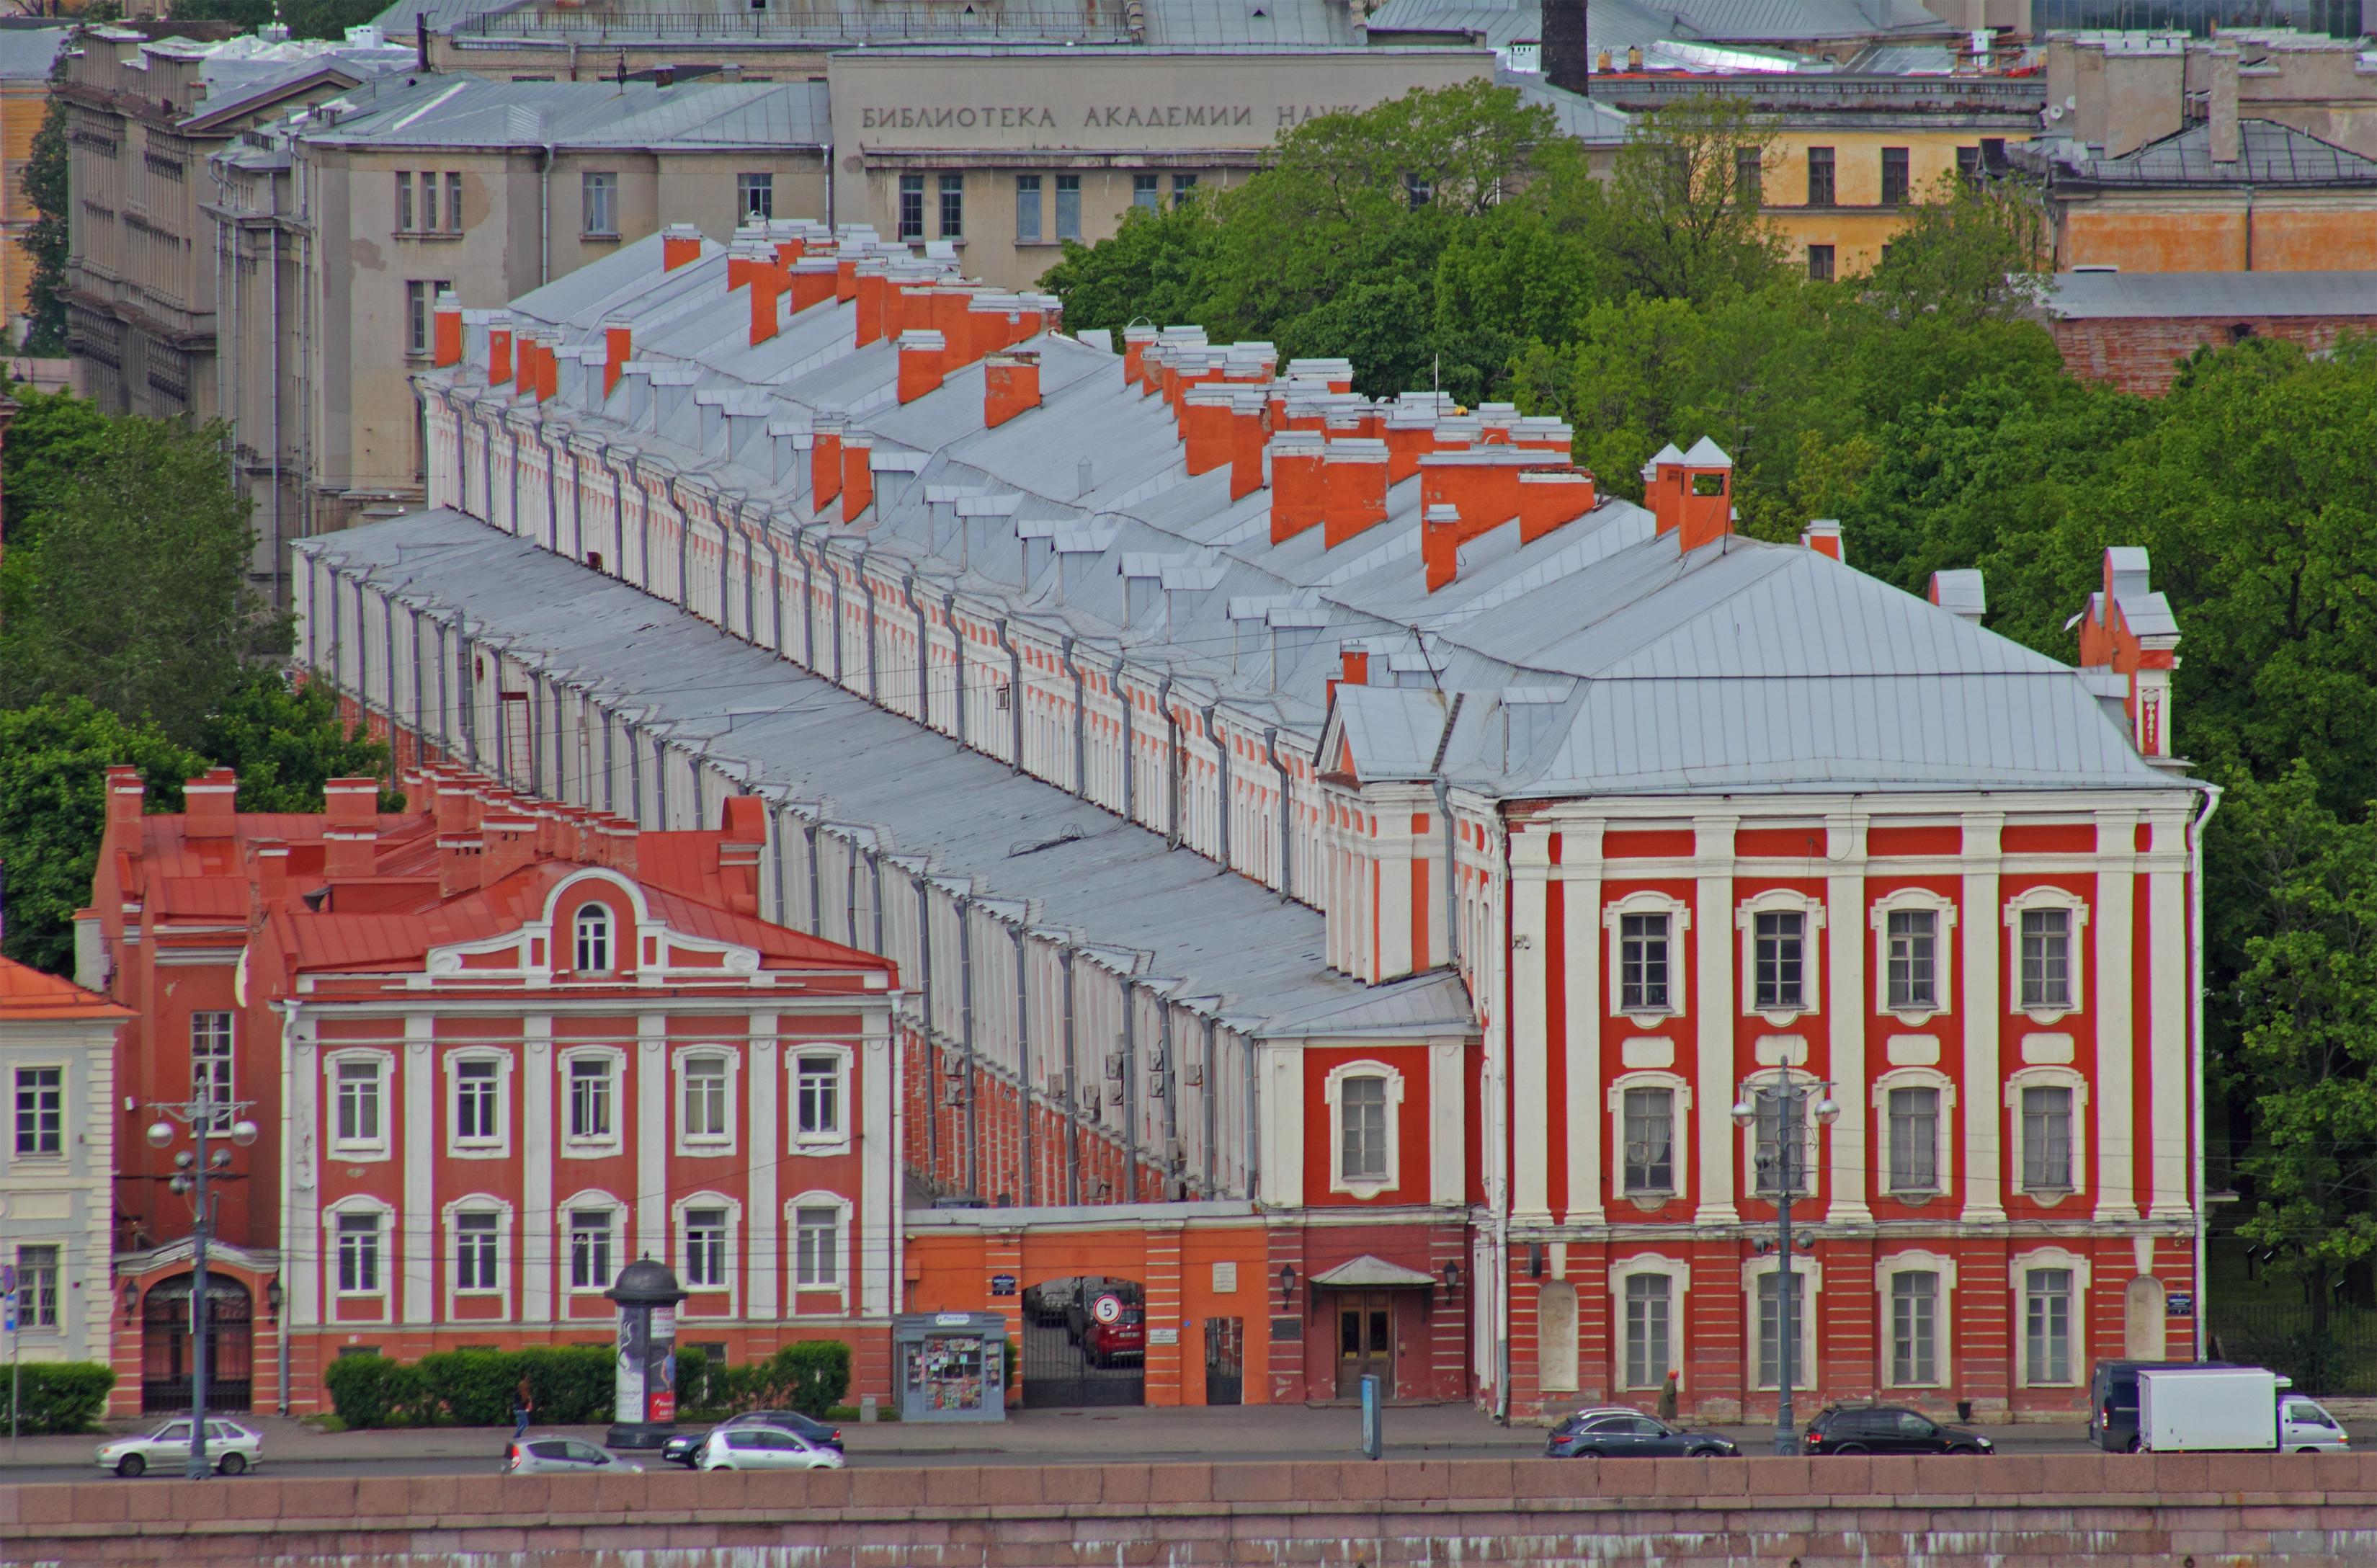 image of Saint Petersburg State University